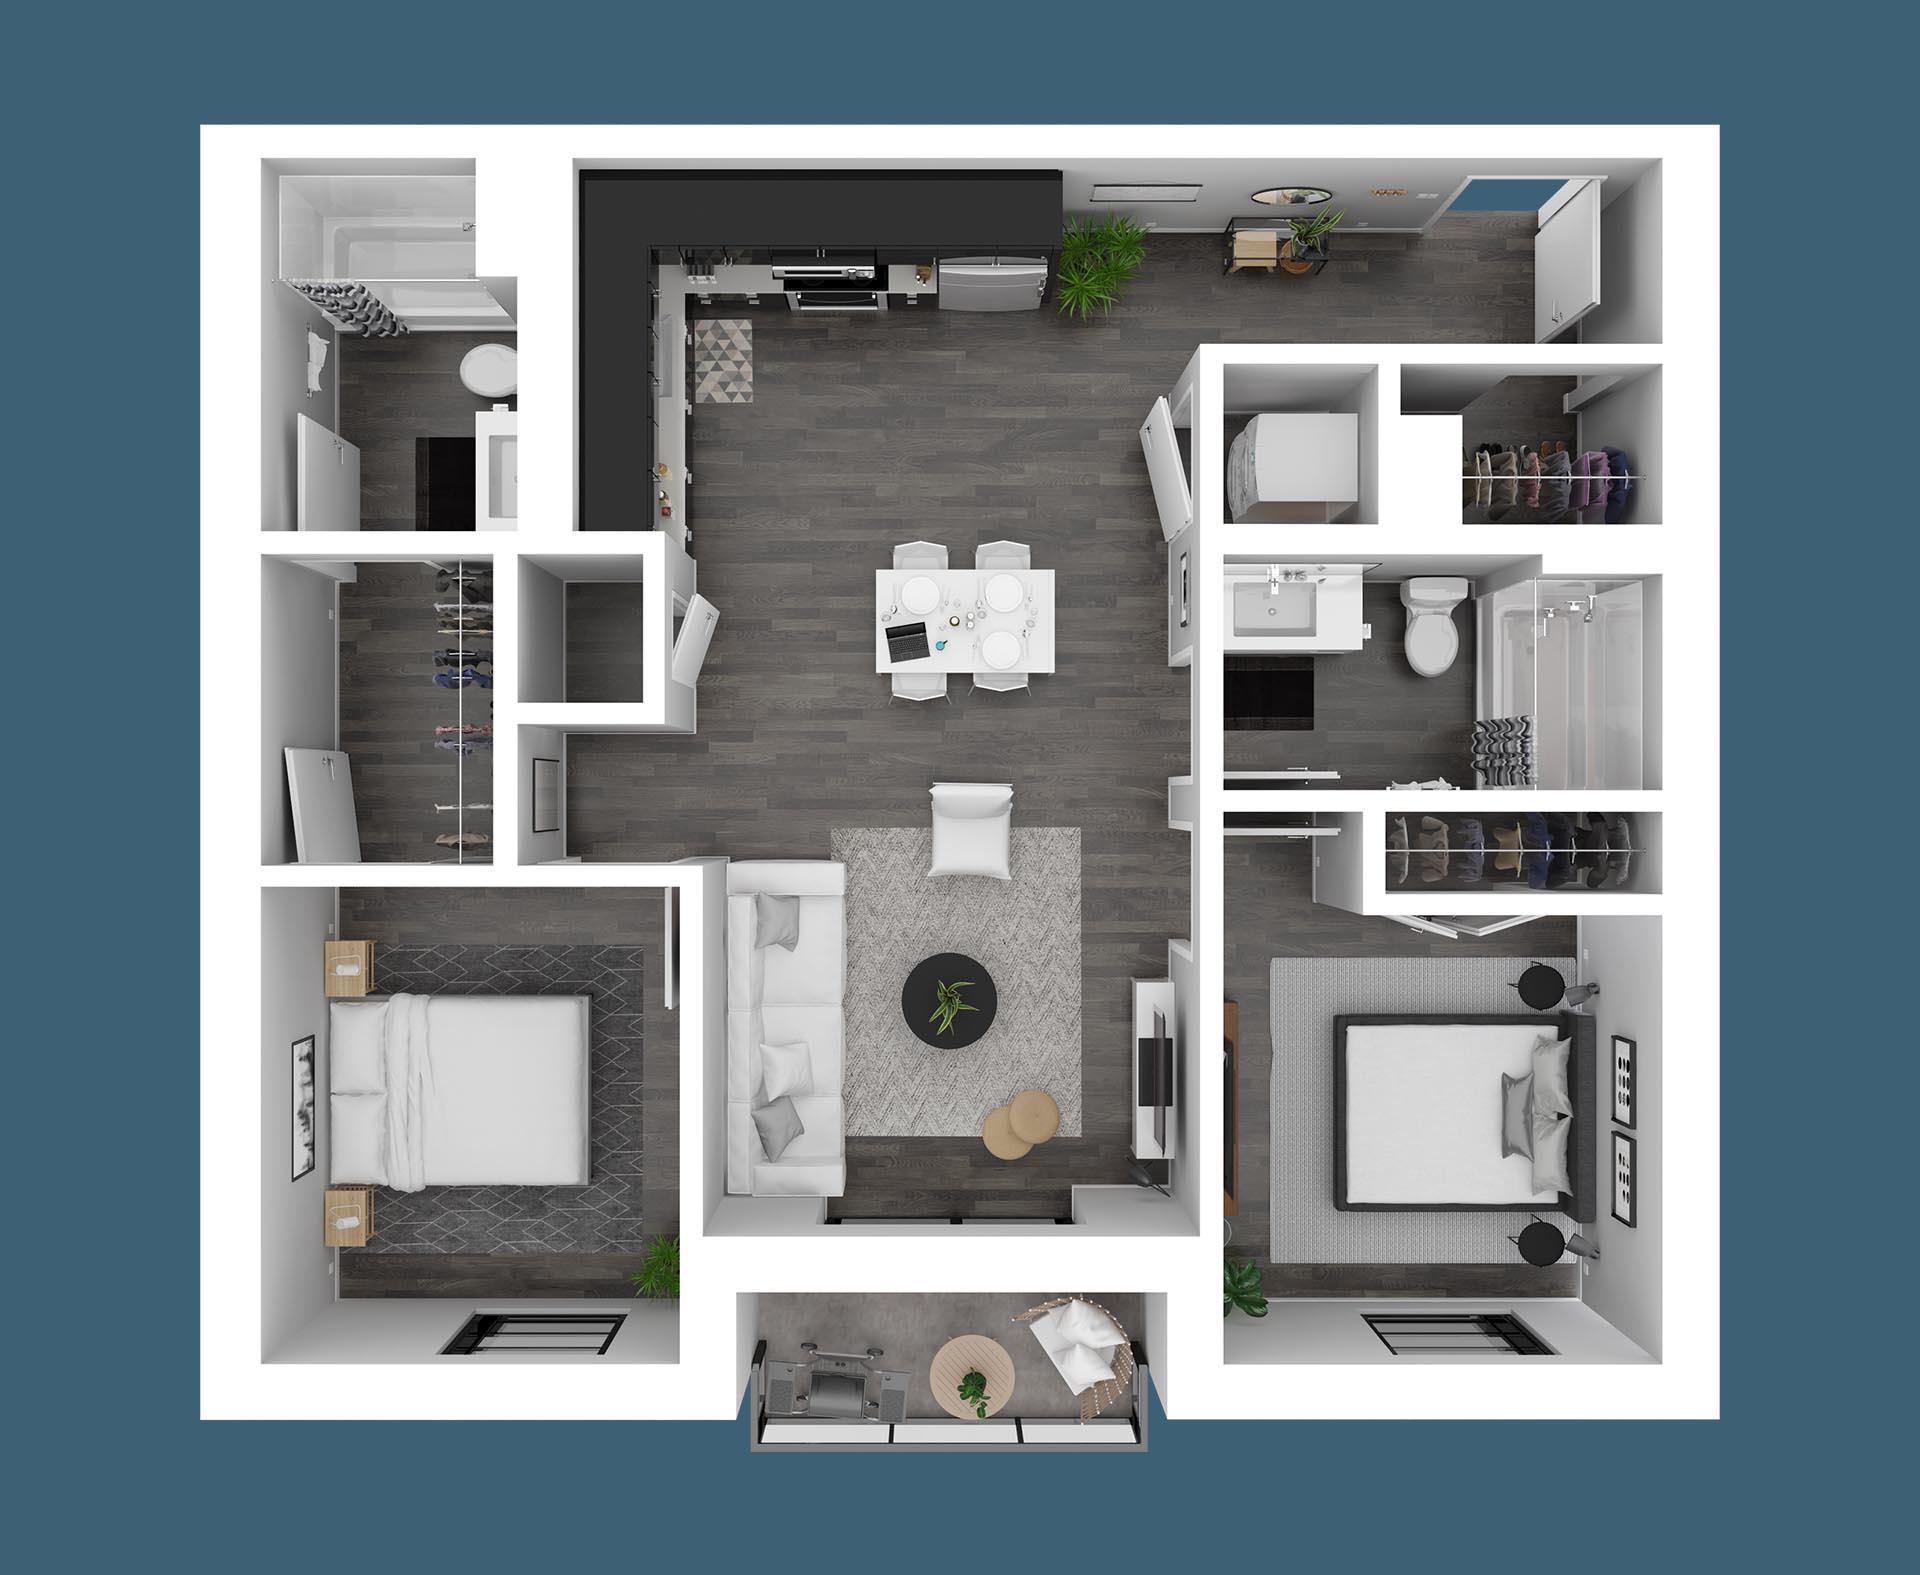 30UC Residence Five image